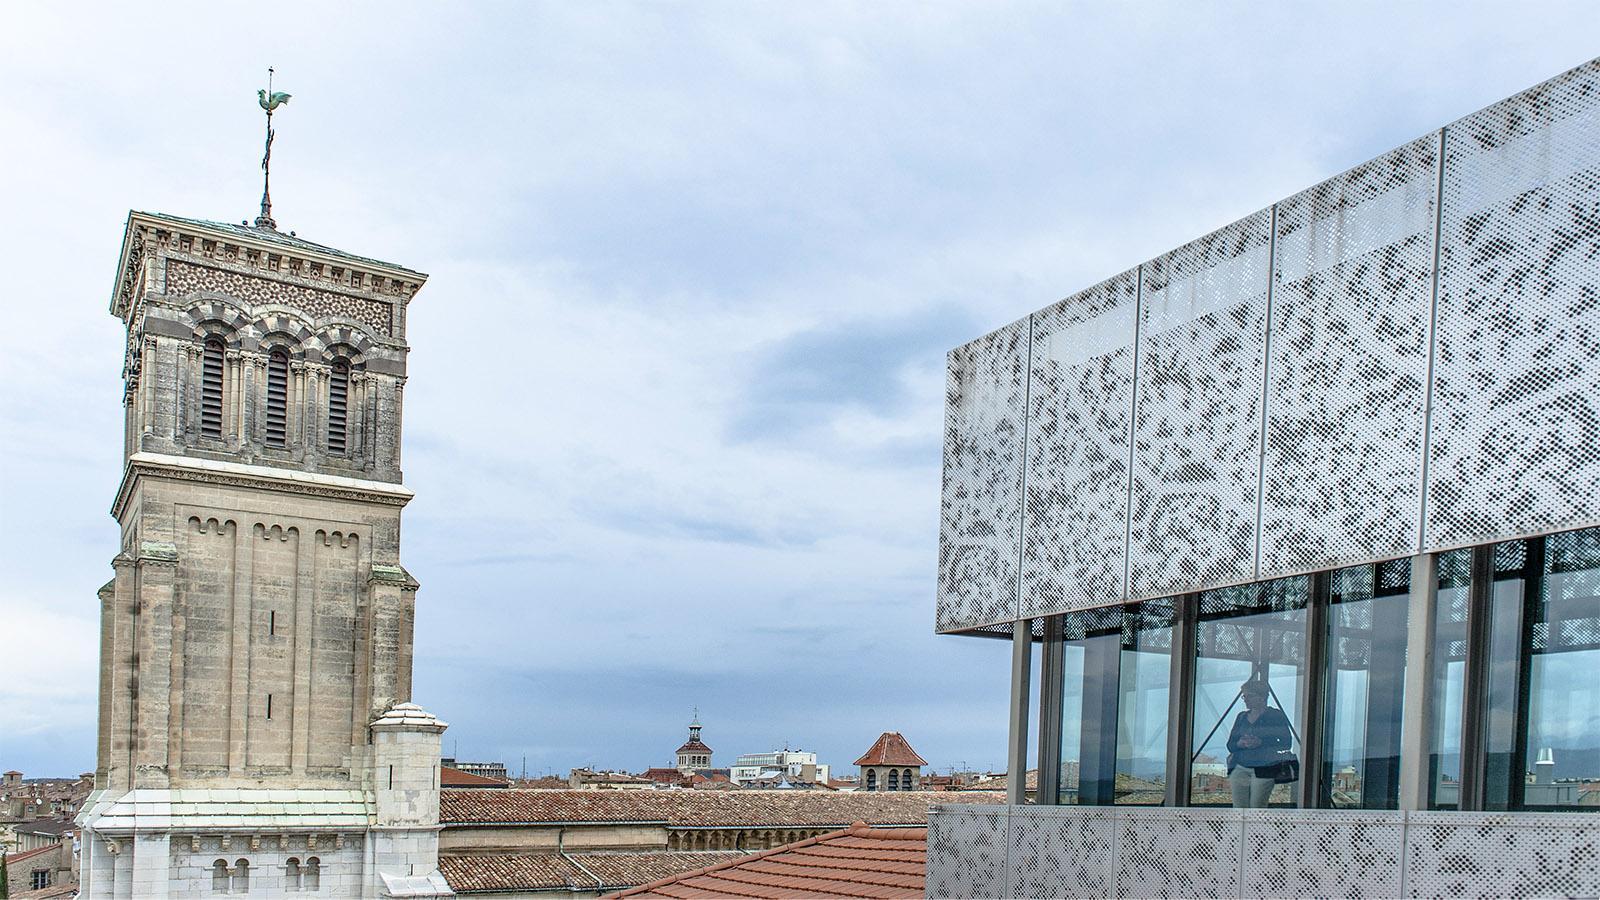 Valence Auf Augenhöhe mit dem Kathdralturm: der Ausblick vom Belvedere des Museums. Foto: Hilke Maunder